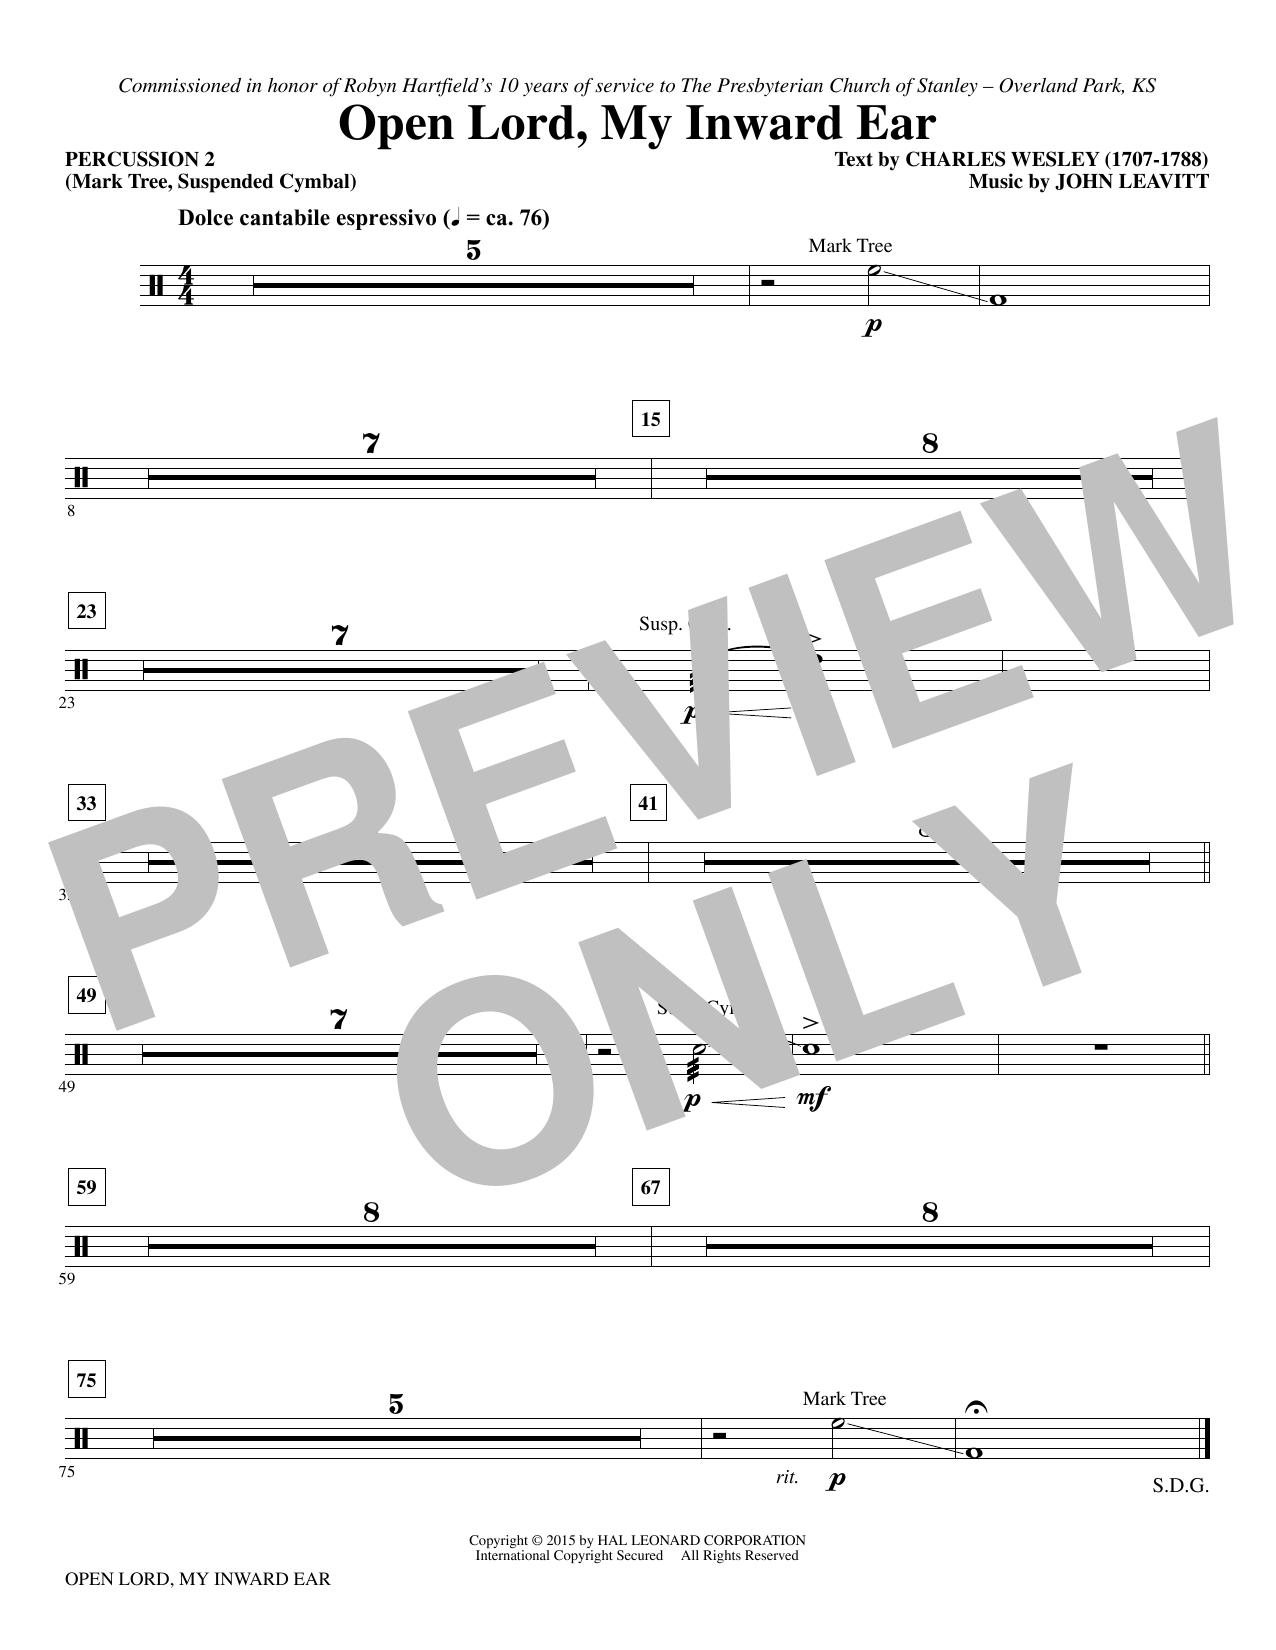 Open Lord, My Inward Ear - Percussion 2 sheet music